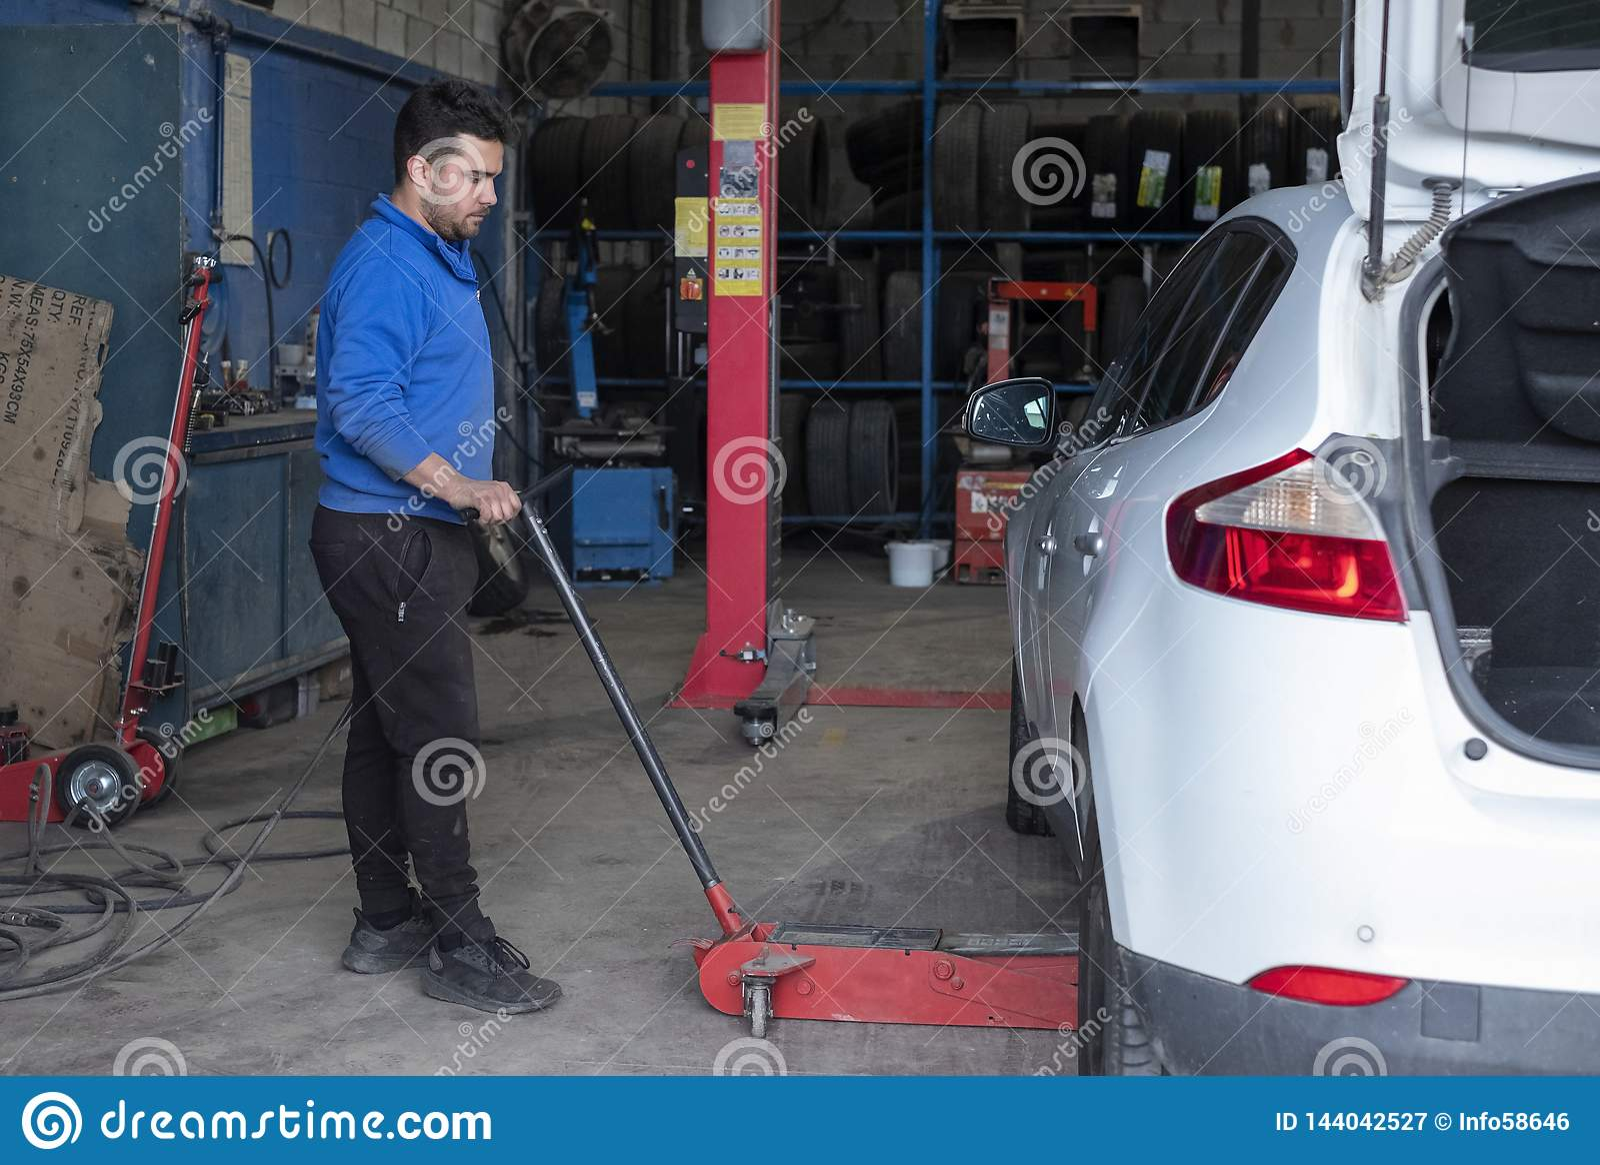 Mechanic lifting car with a hydraulic jack in a workshop